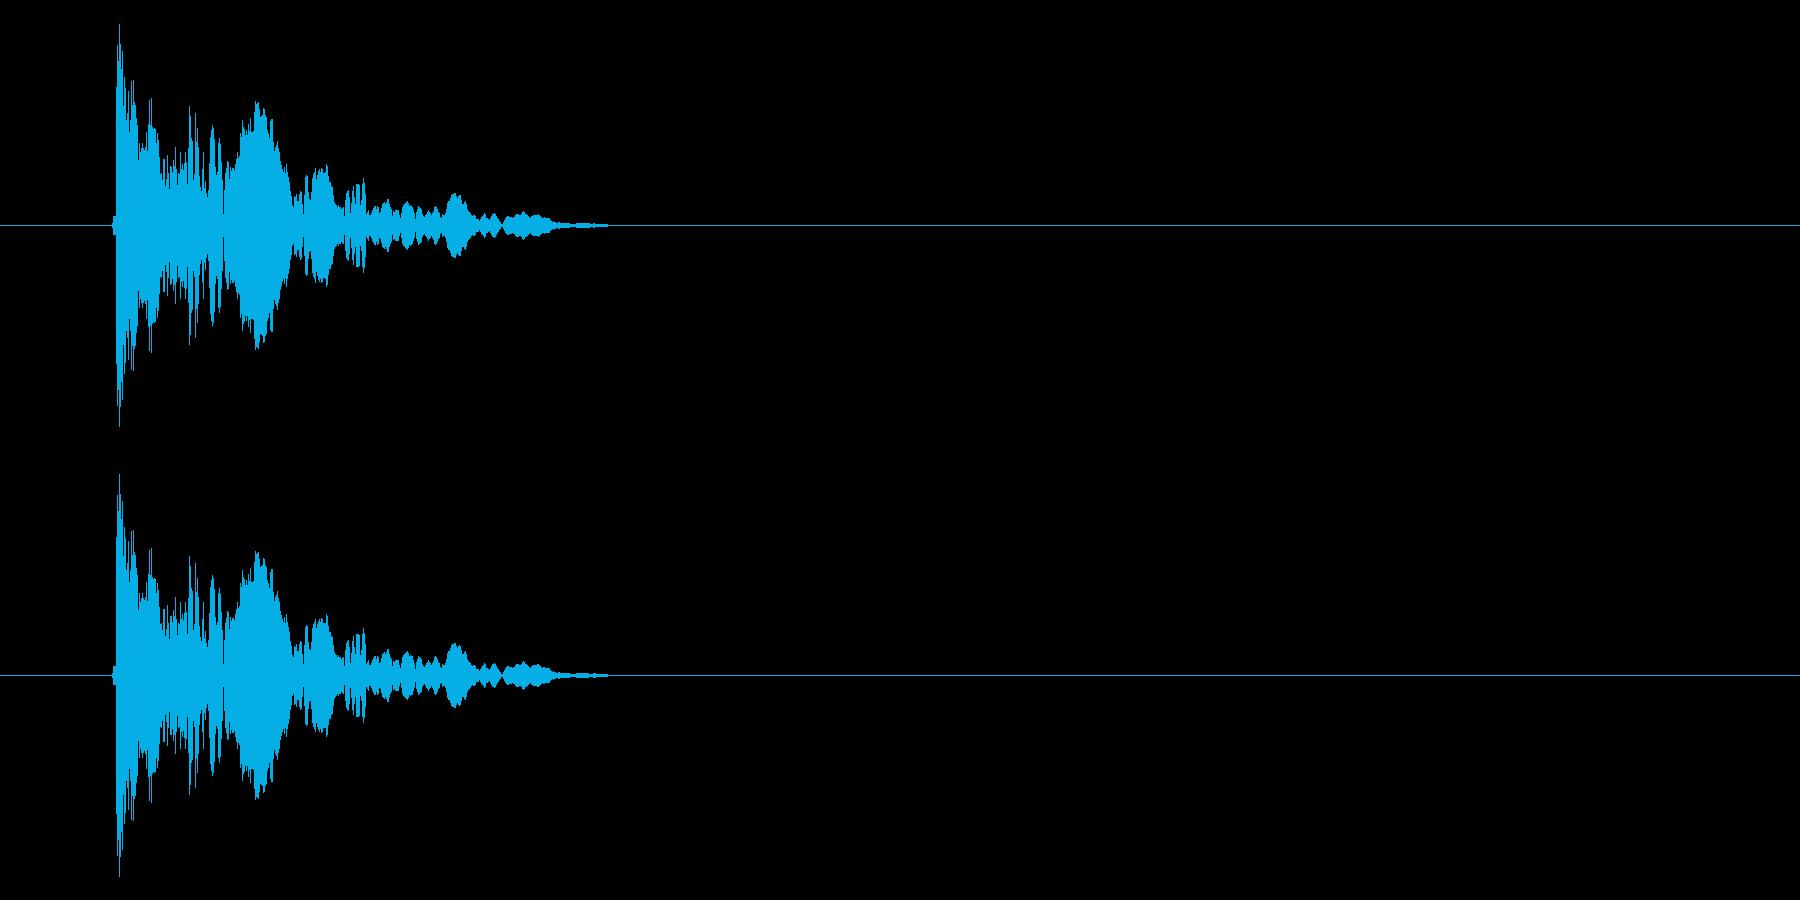 SNES 野球01-01(金属バット)の再生済みの波形